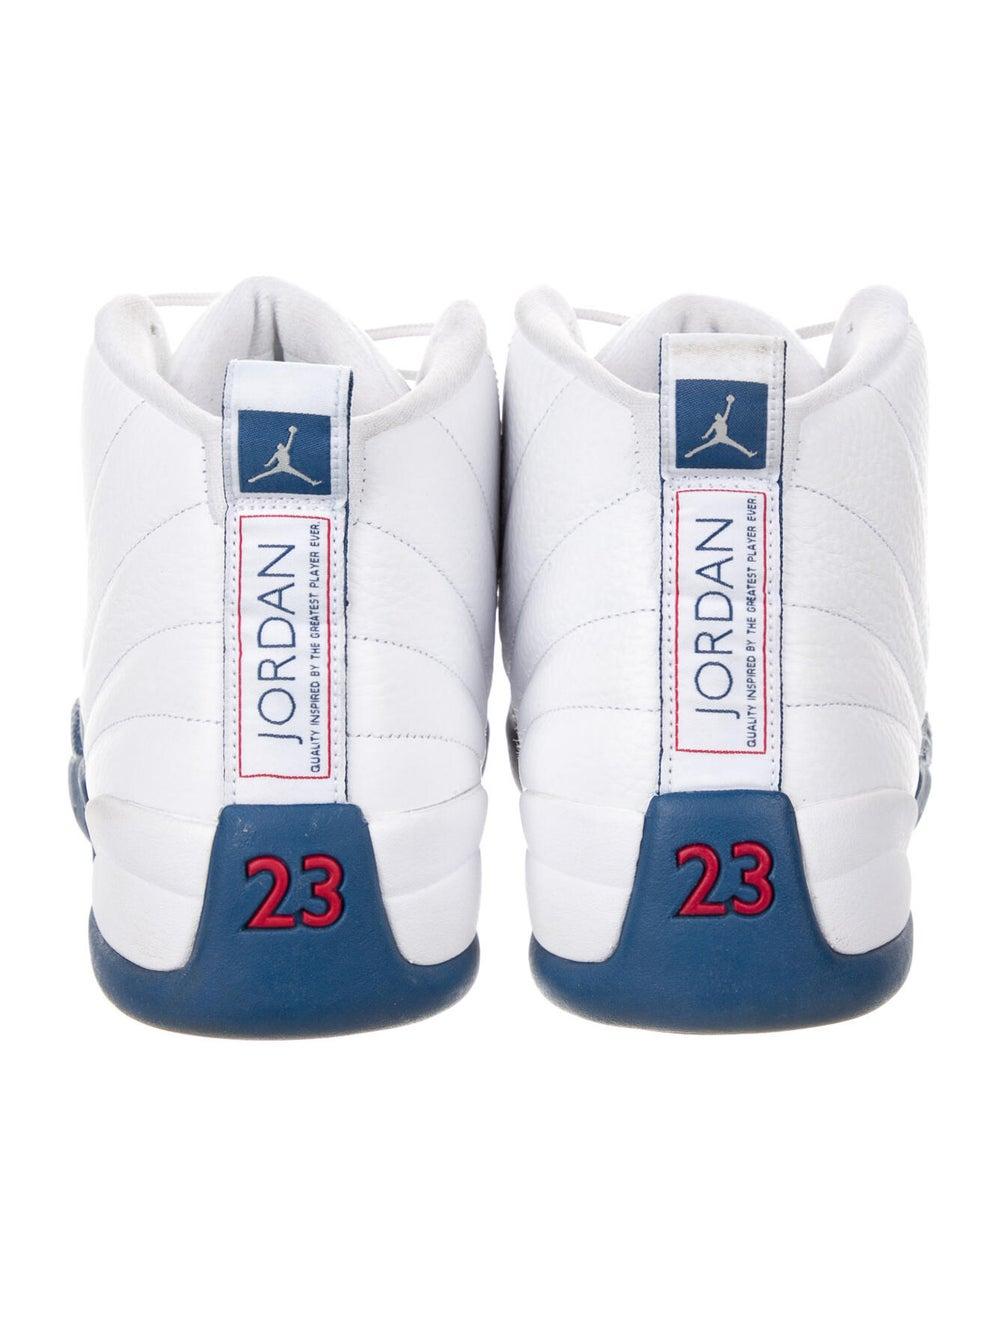 Jordan Jordan 12 Retro French Blue Sneakers Blue - image 4